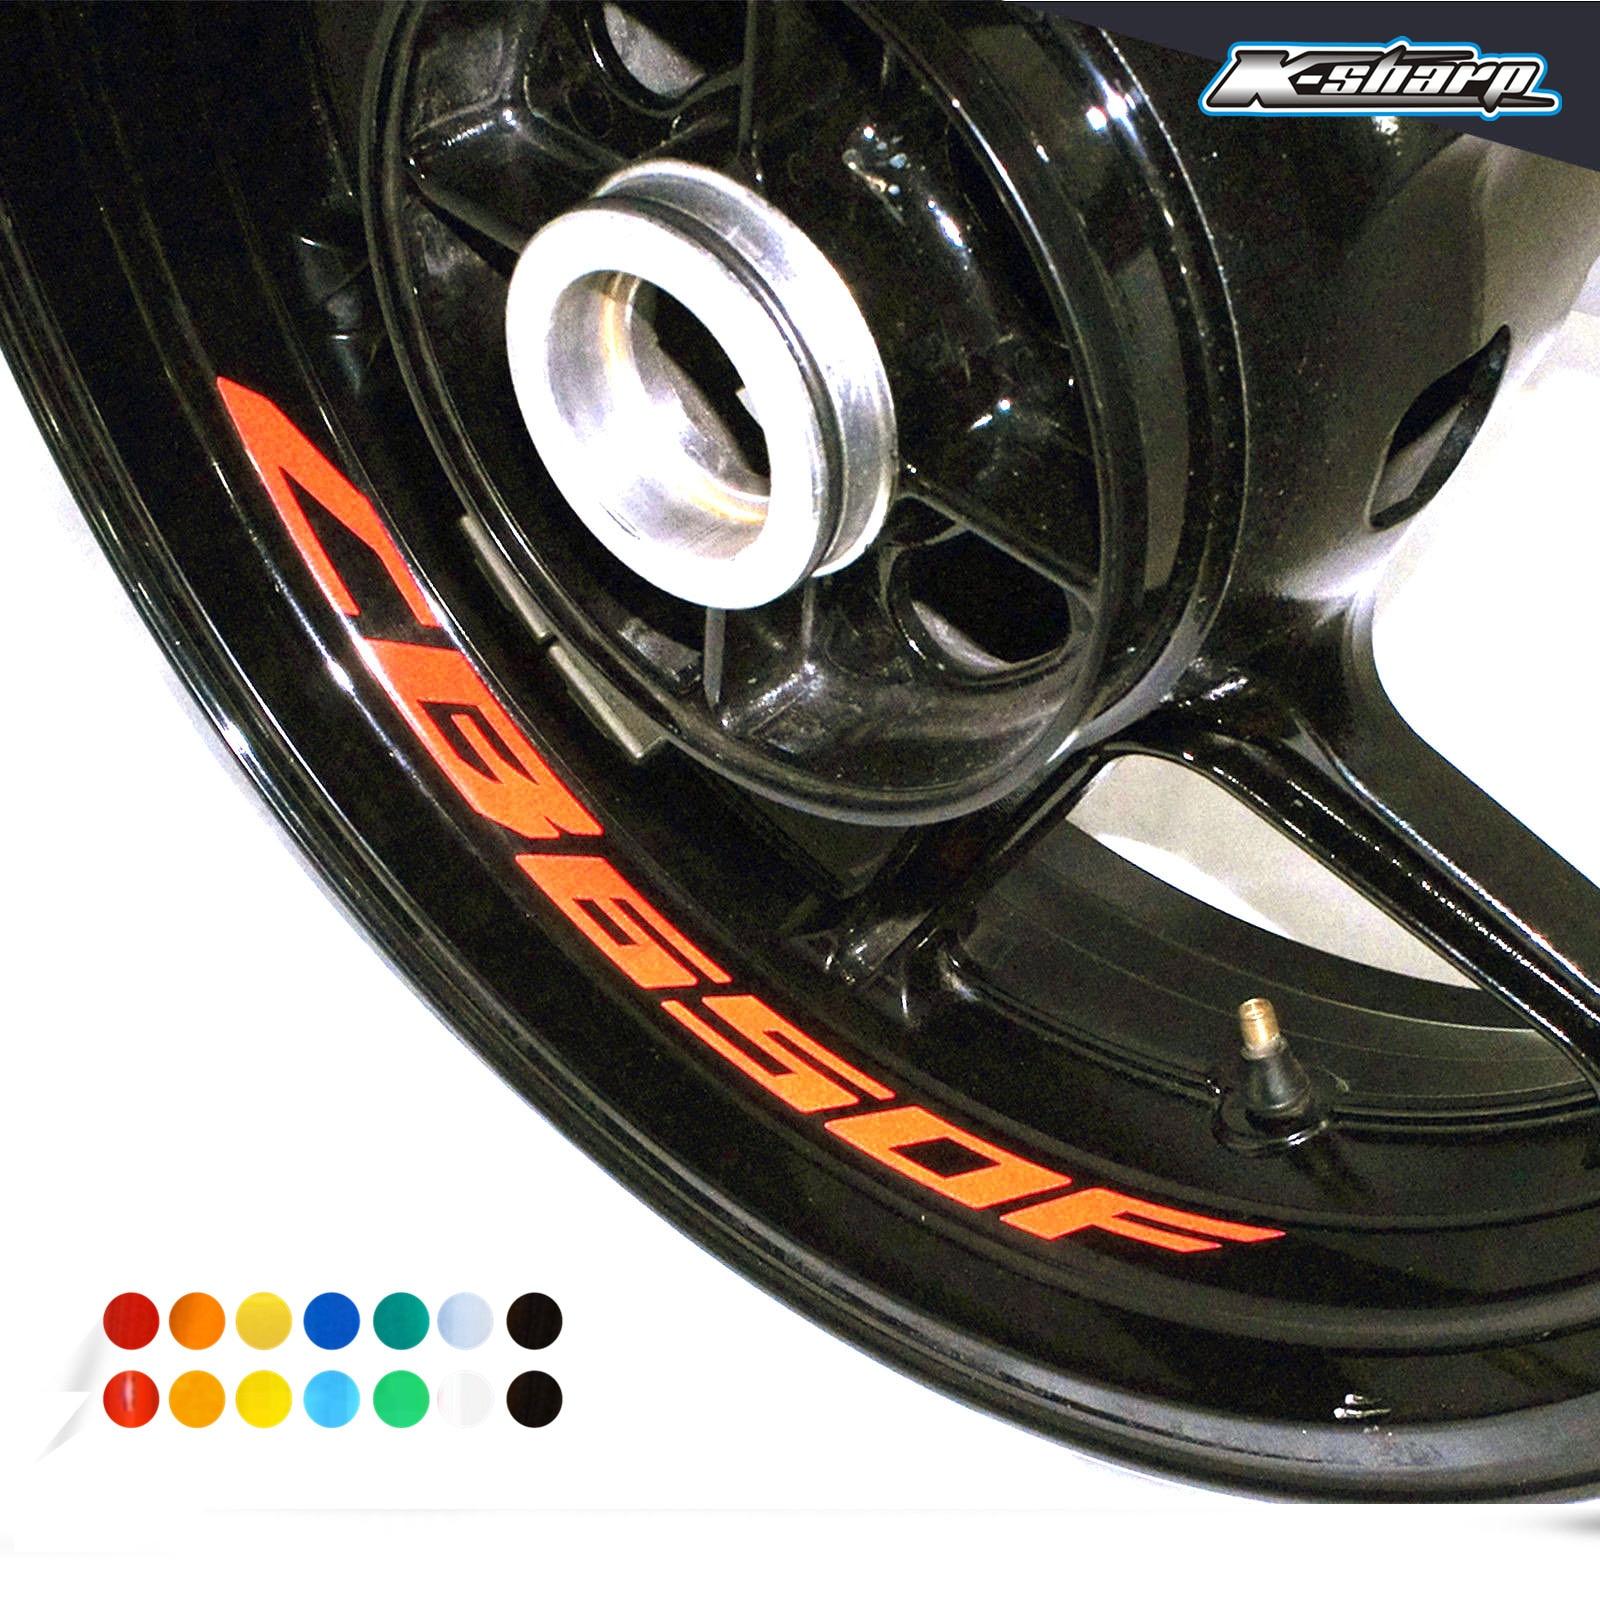 8 X Custon Inner Rim Decals Wheel Reflective Stickers Stripes FIT HONDA CB650F